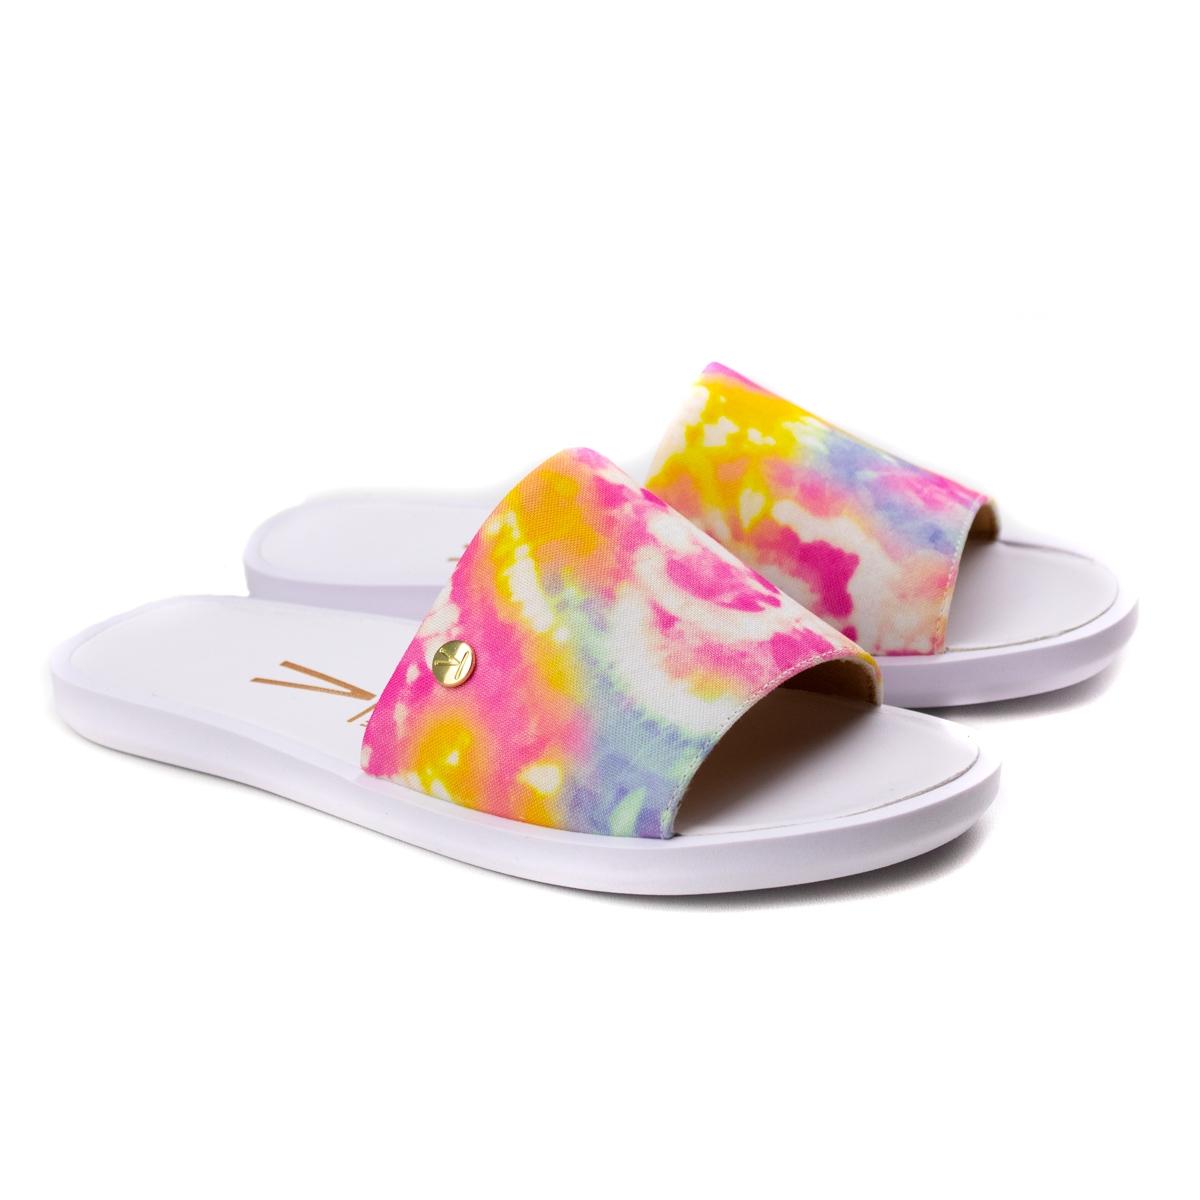 Tamanco Slide Tie Die Feminino Vizzano - Multi color